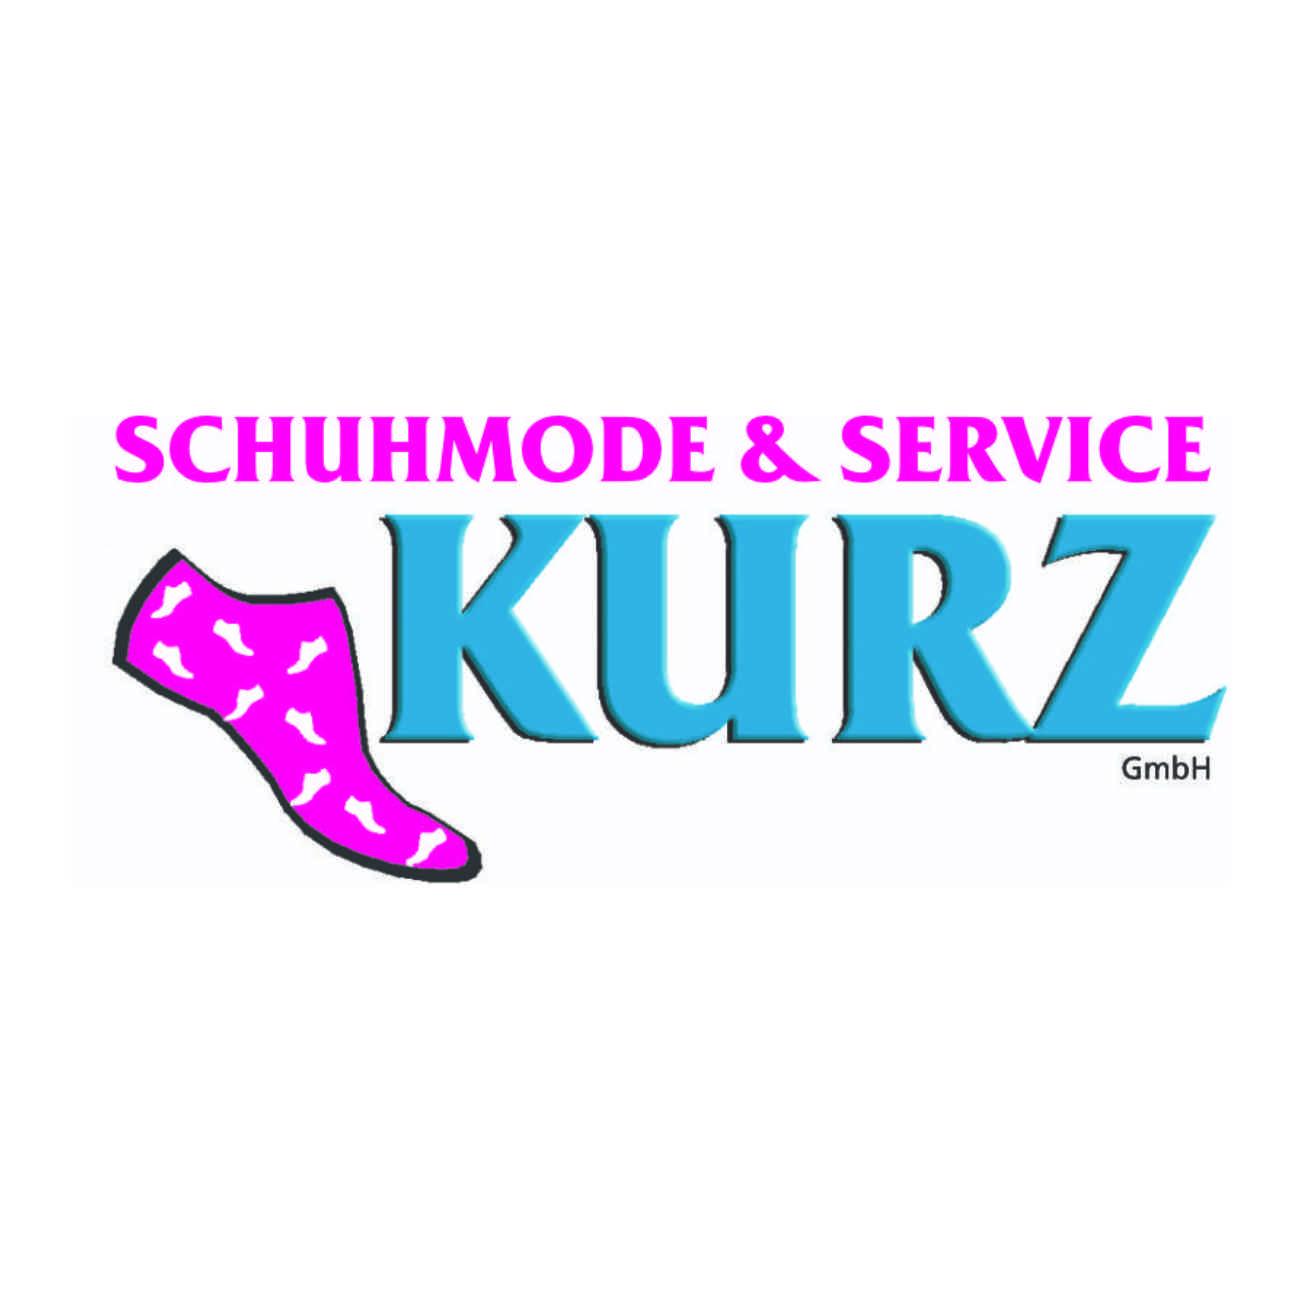 Schuhmode & Service Kurz